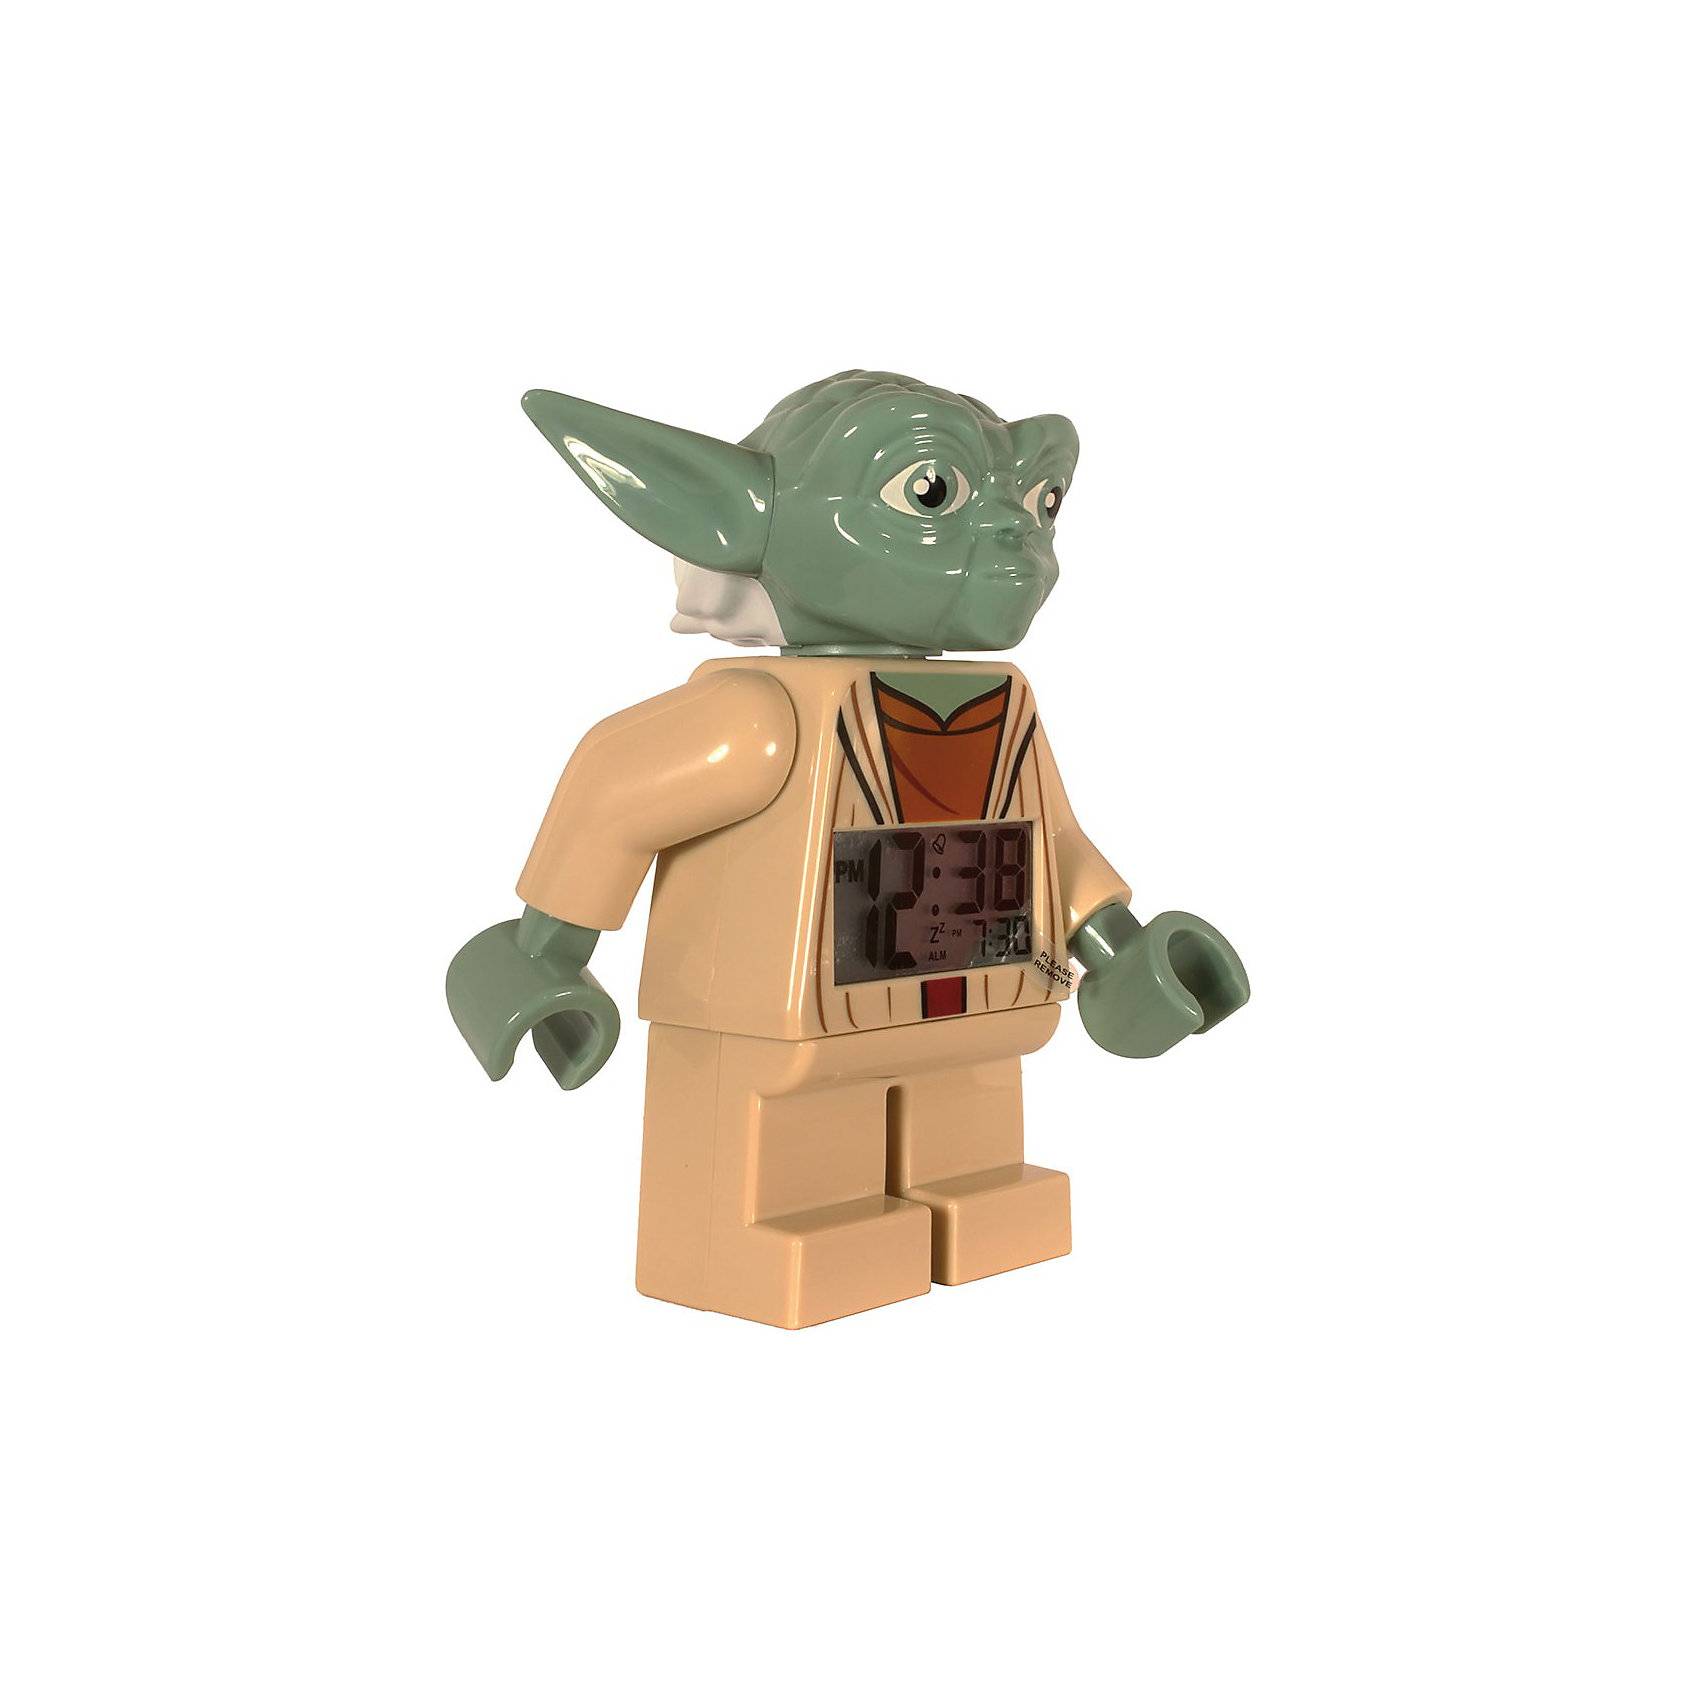 LEGO Star Wars Будильник Йода